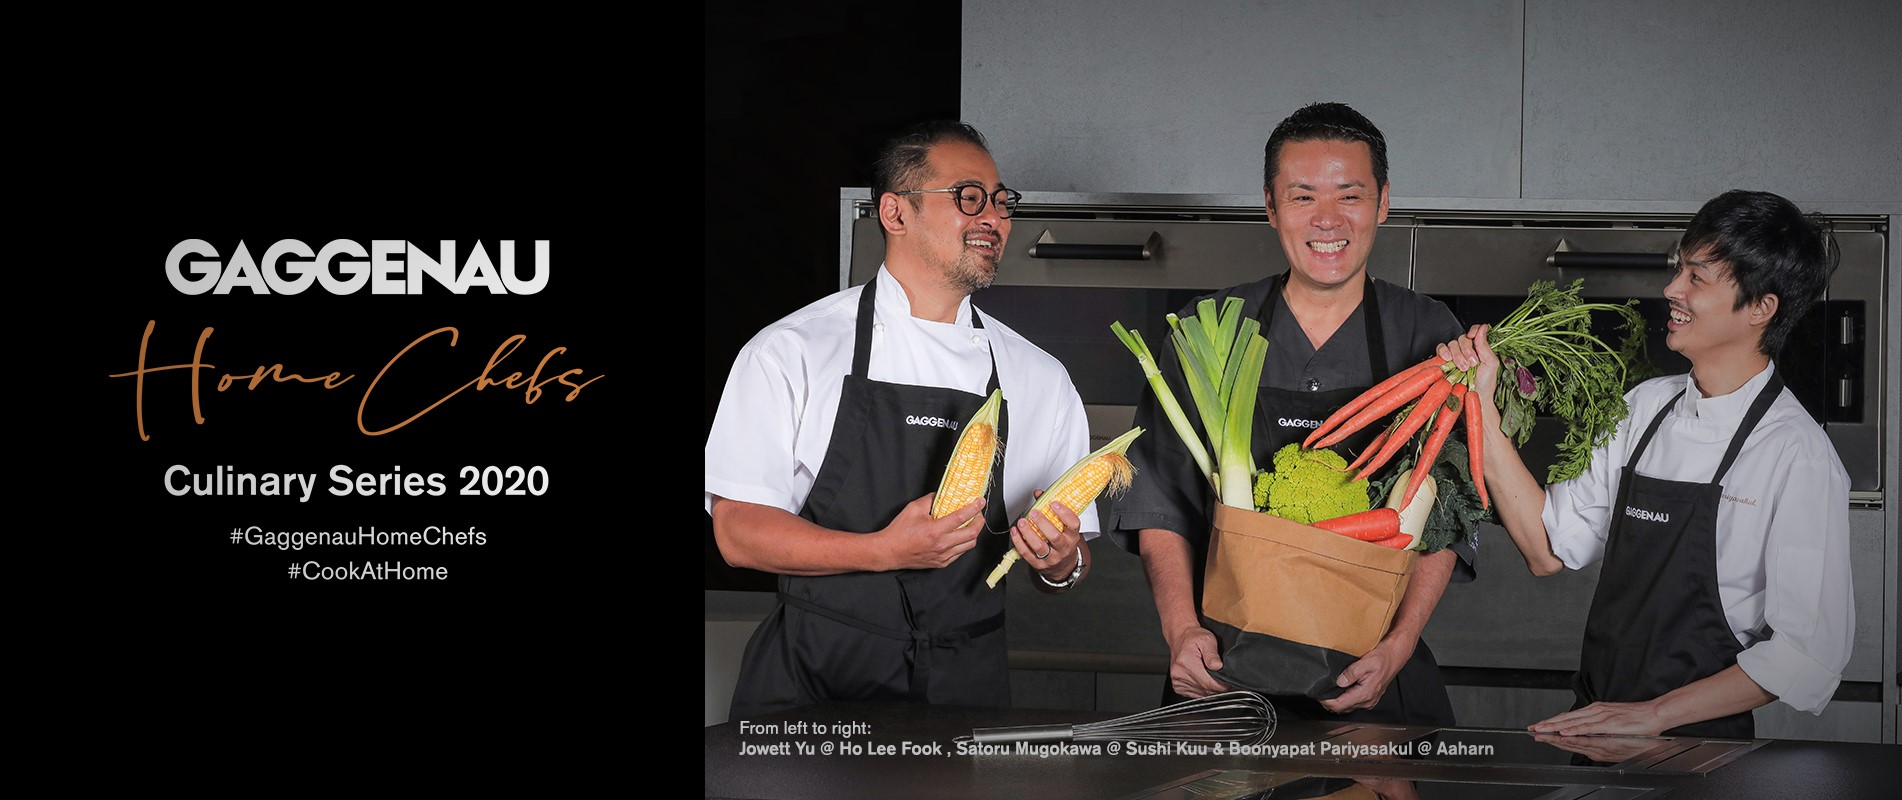 Gaggenau Home Chefs 2020